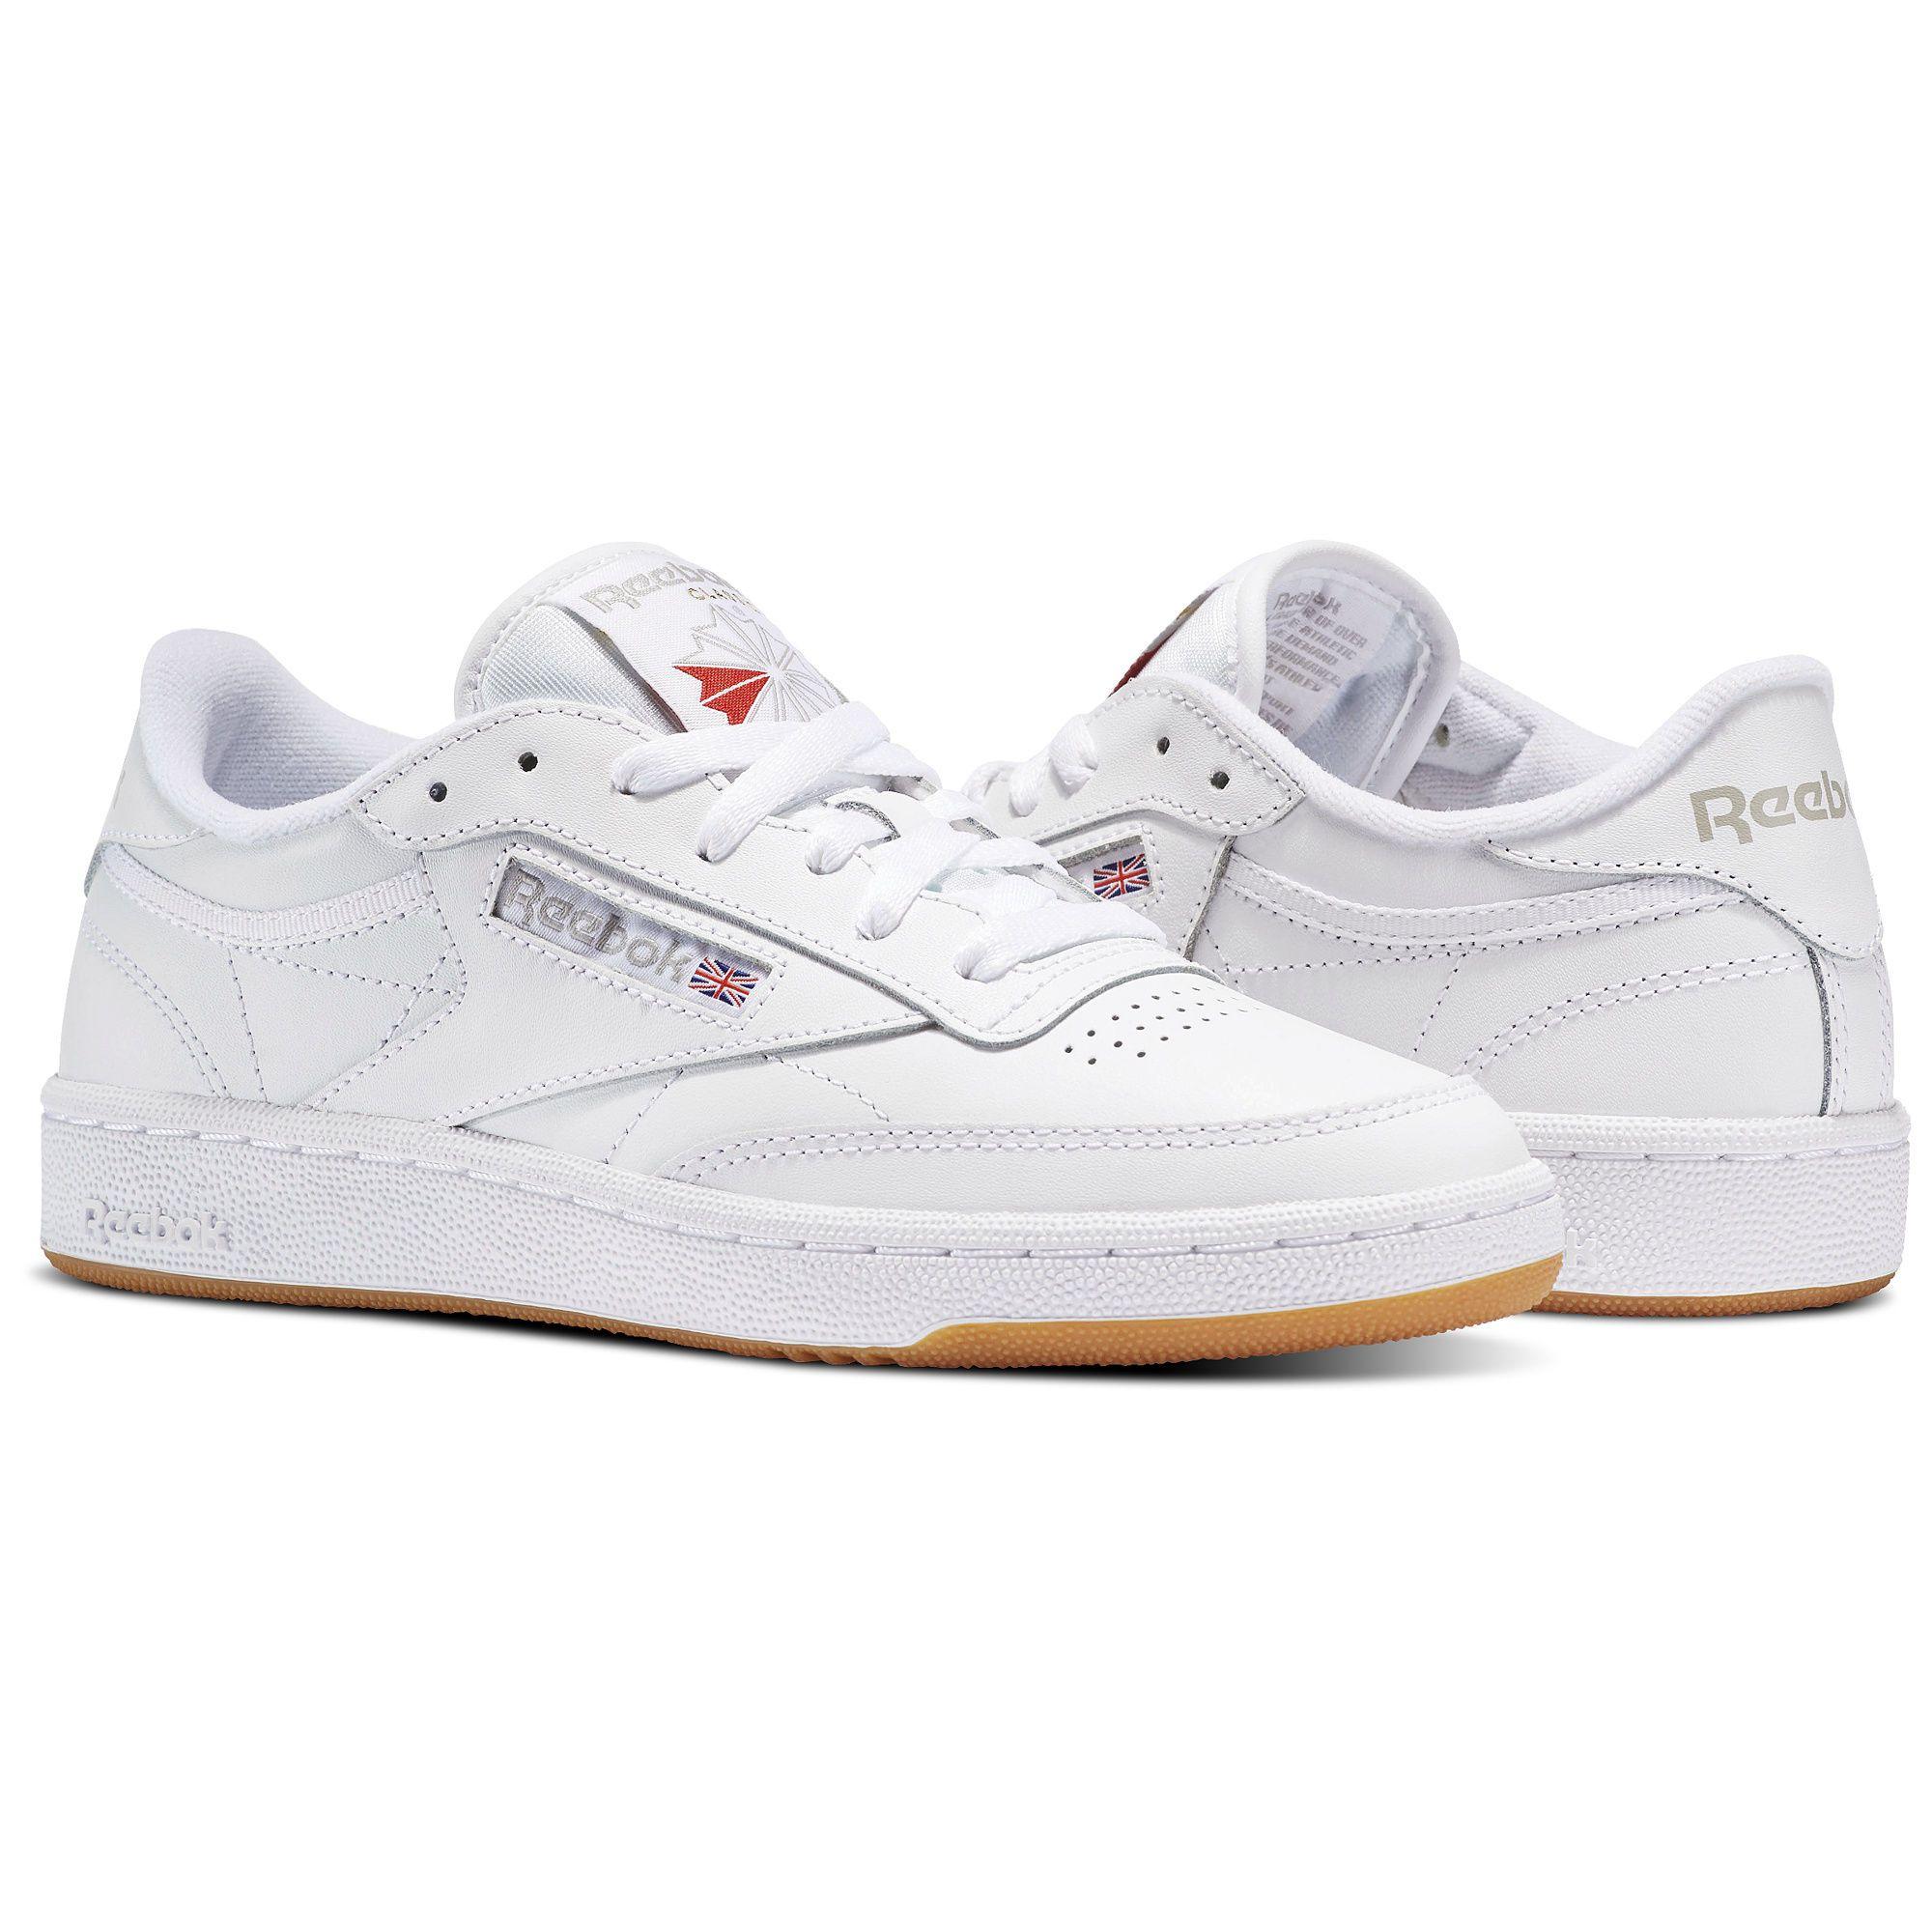 Reebok Shoes Women's Club C 85 in WhiteLight GreyGum Size